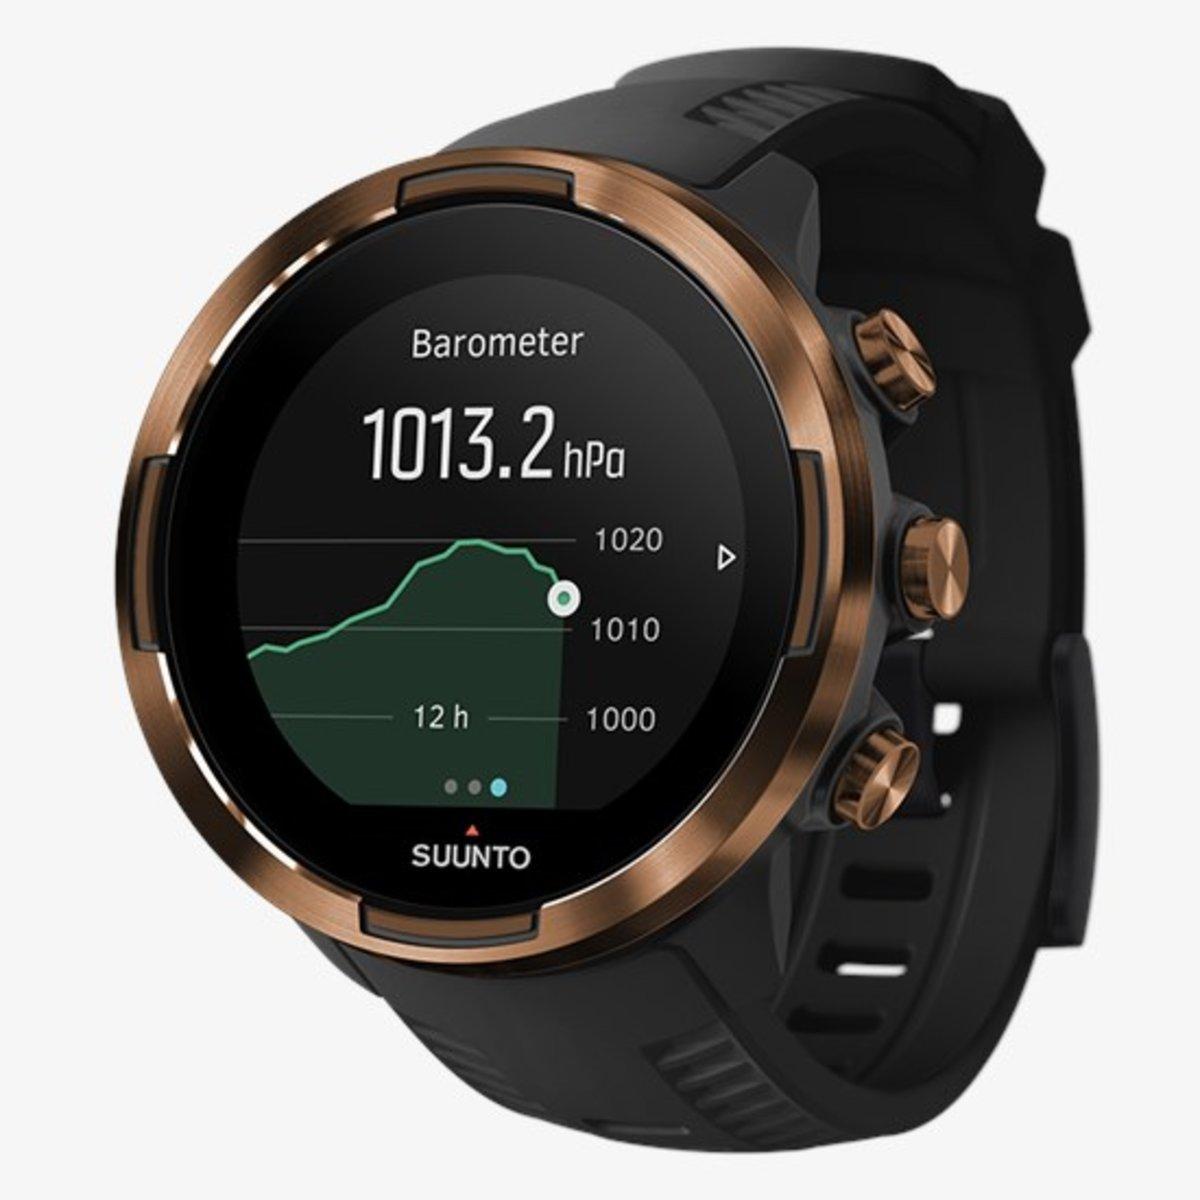 9 Baro Copper 全方位運動智能手錶[SS050250000]